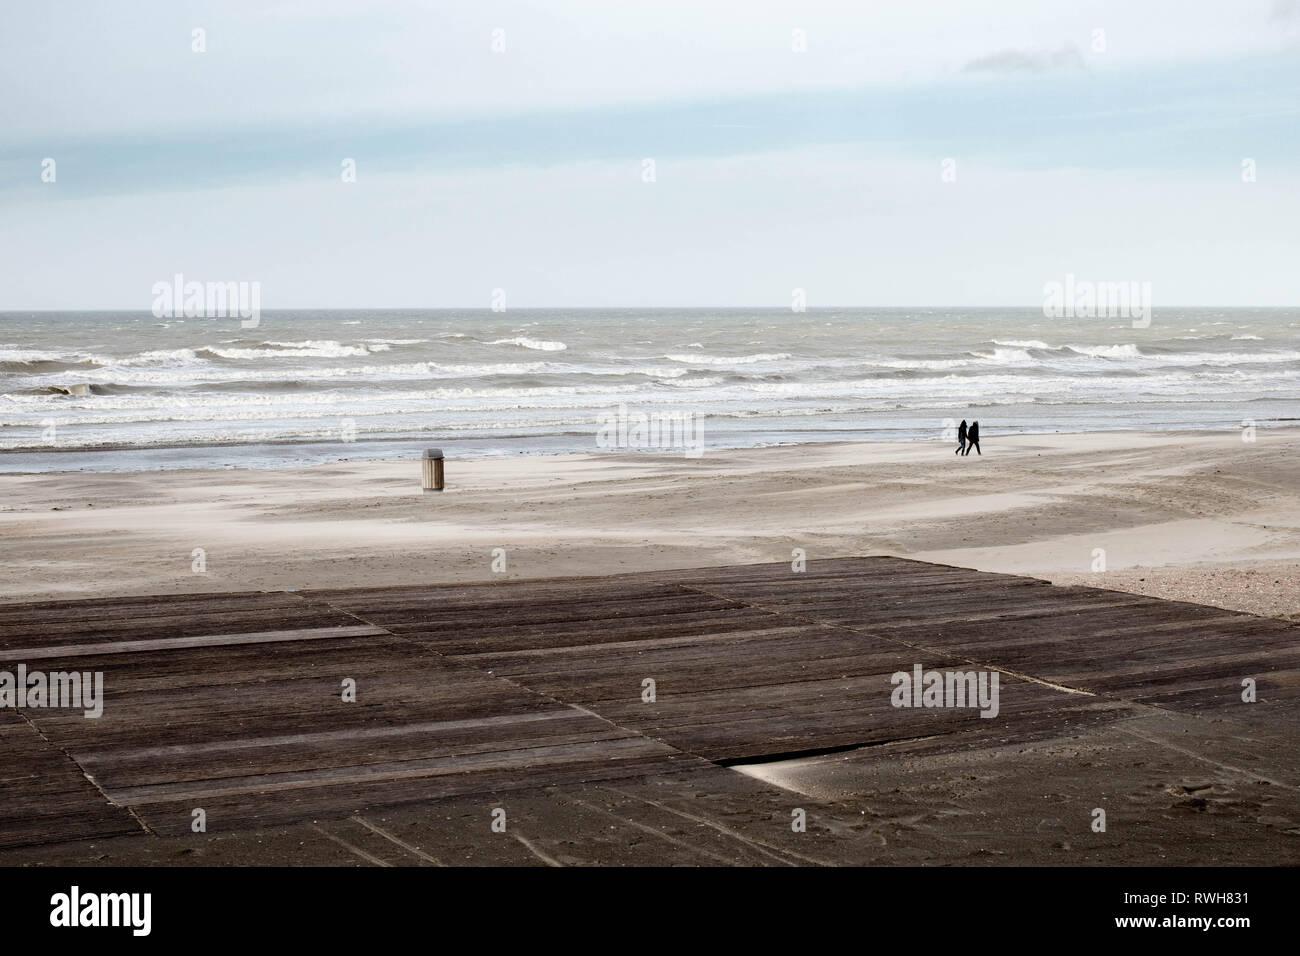 Nieuwpoort, Belgium - February 9, 2019 - People walking on the beach Stock Photo